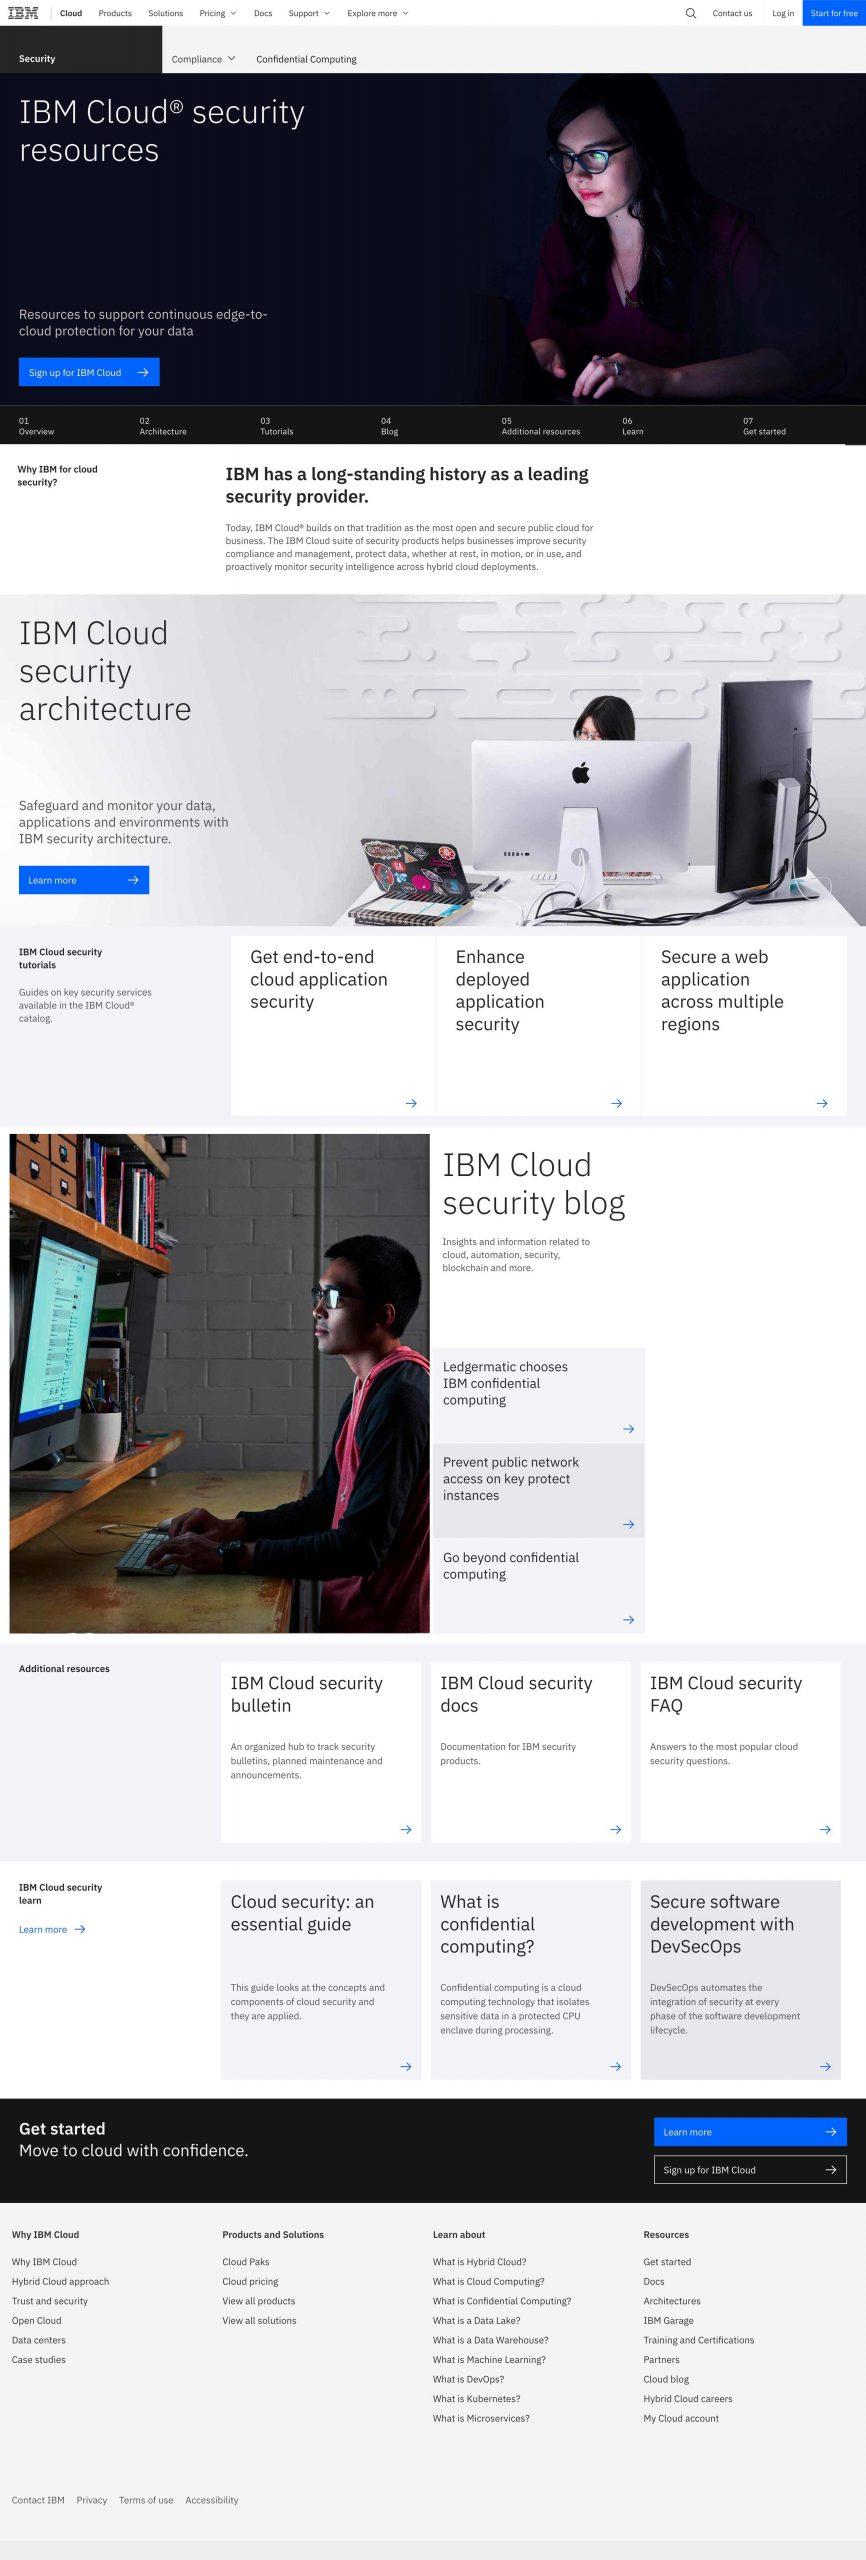 006-Cloud-Security-IBM